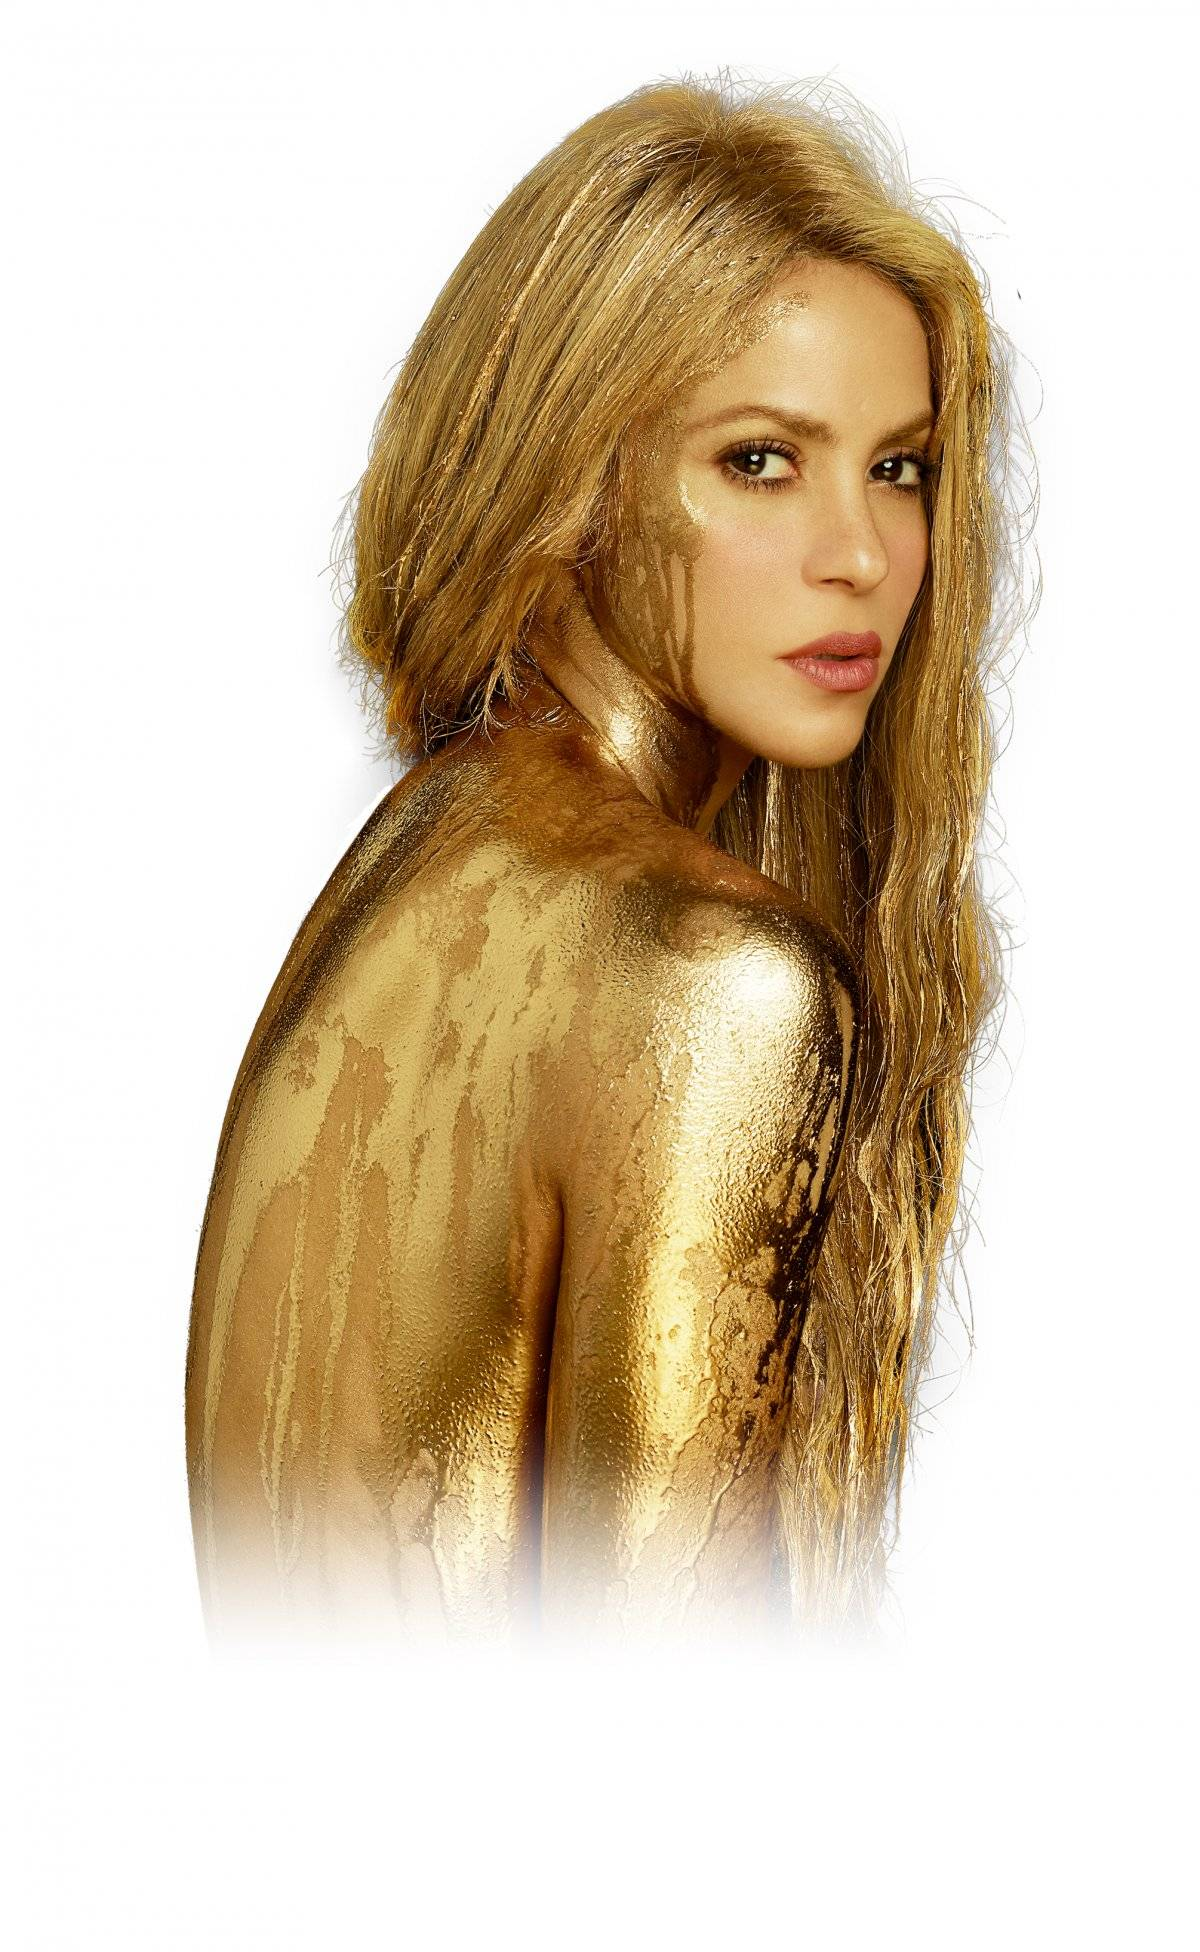 Cortesía Shakira El Dorado World Tour